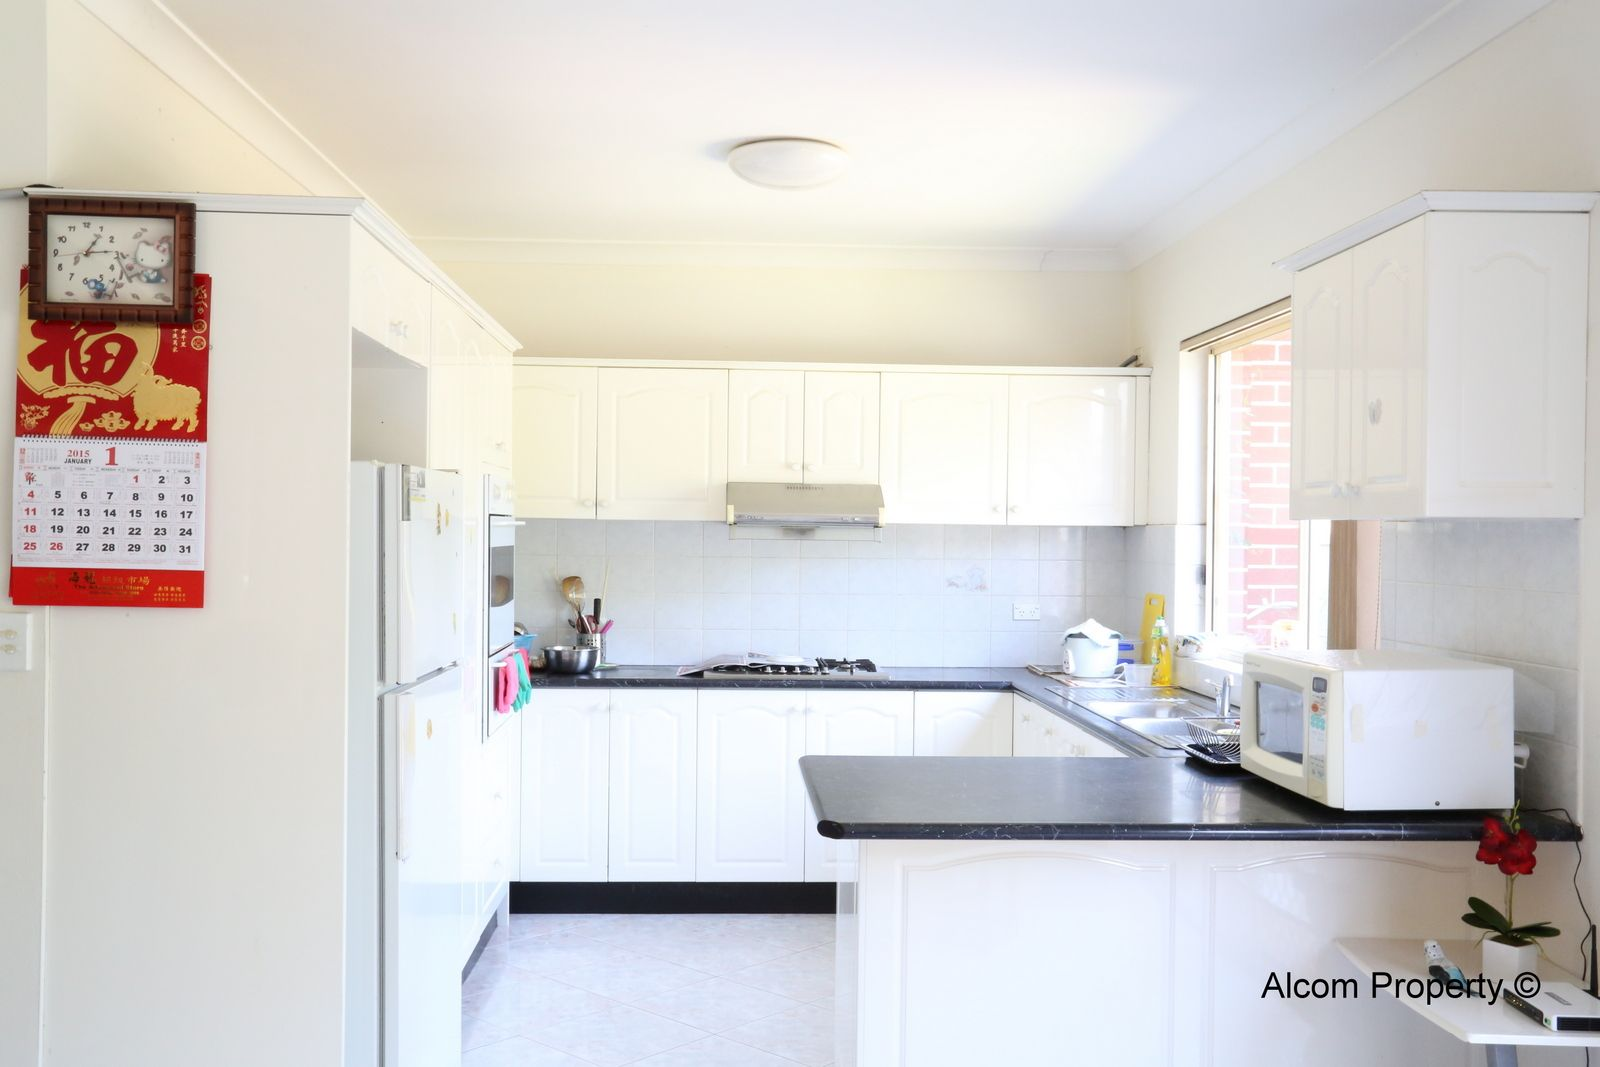 16A Hillcrest Ave, Hurstville NSW 2220 - Duplex For Rent